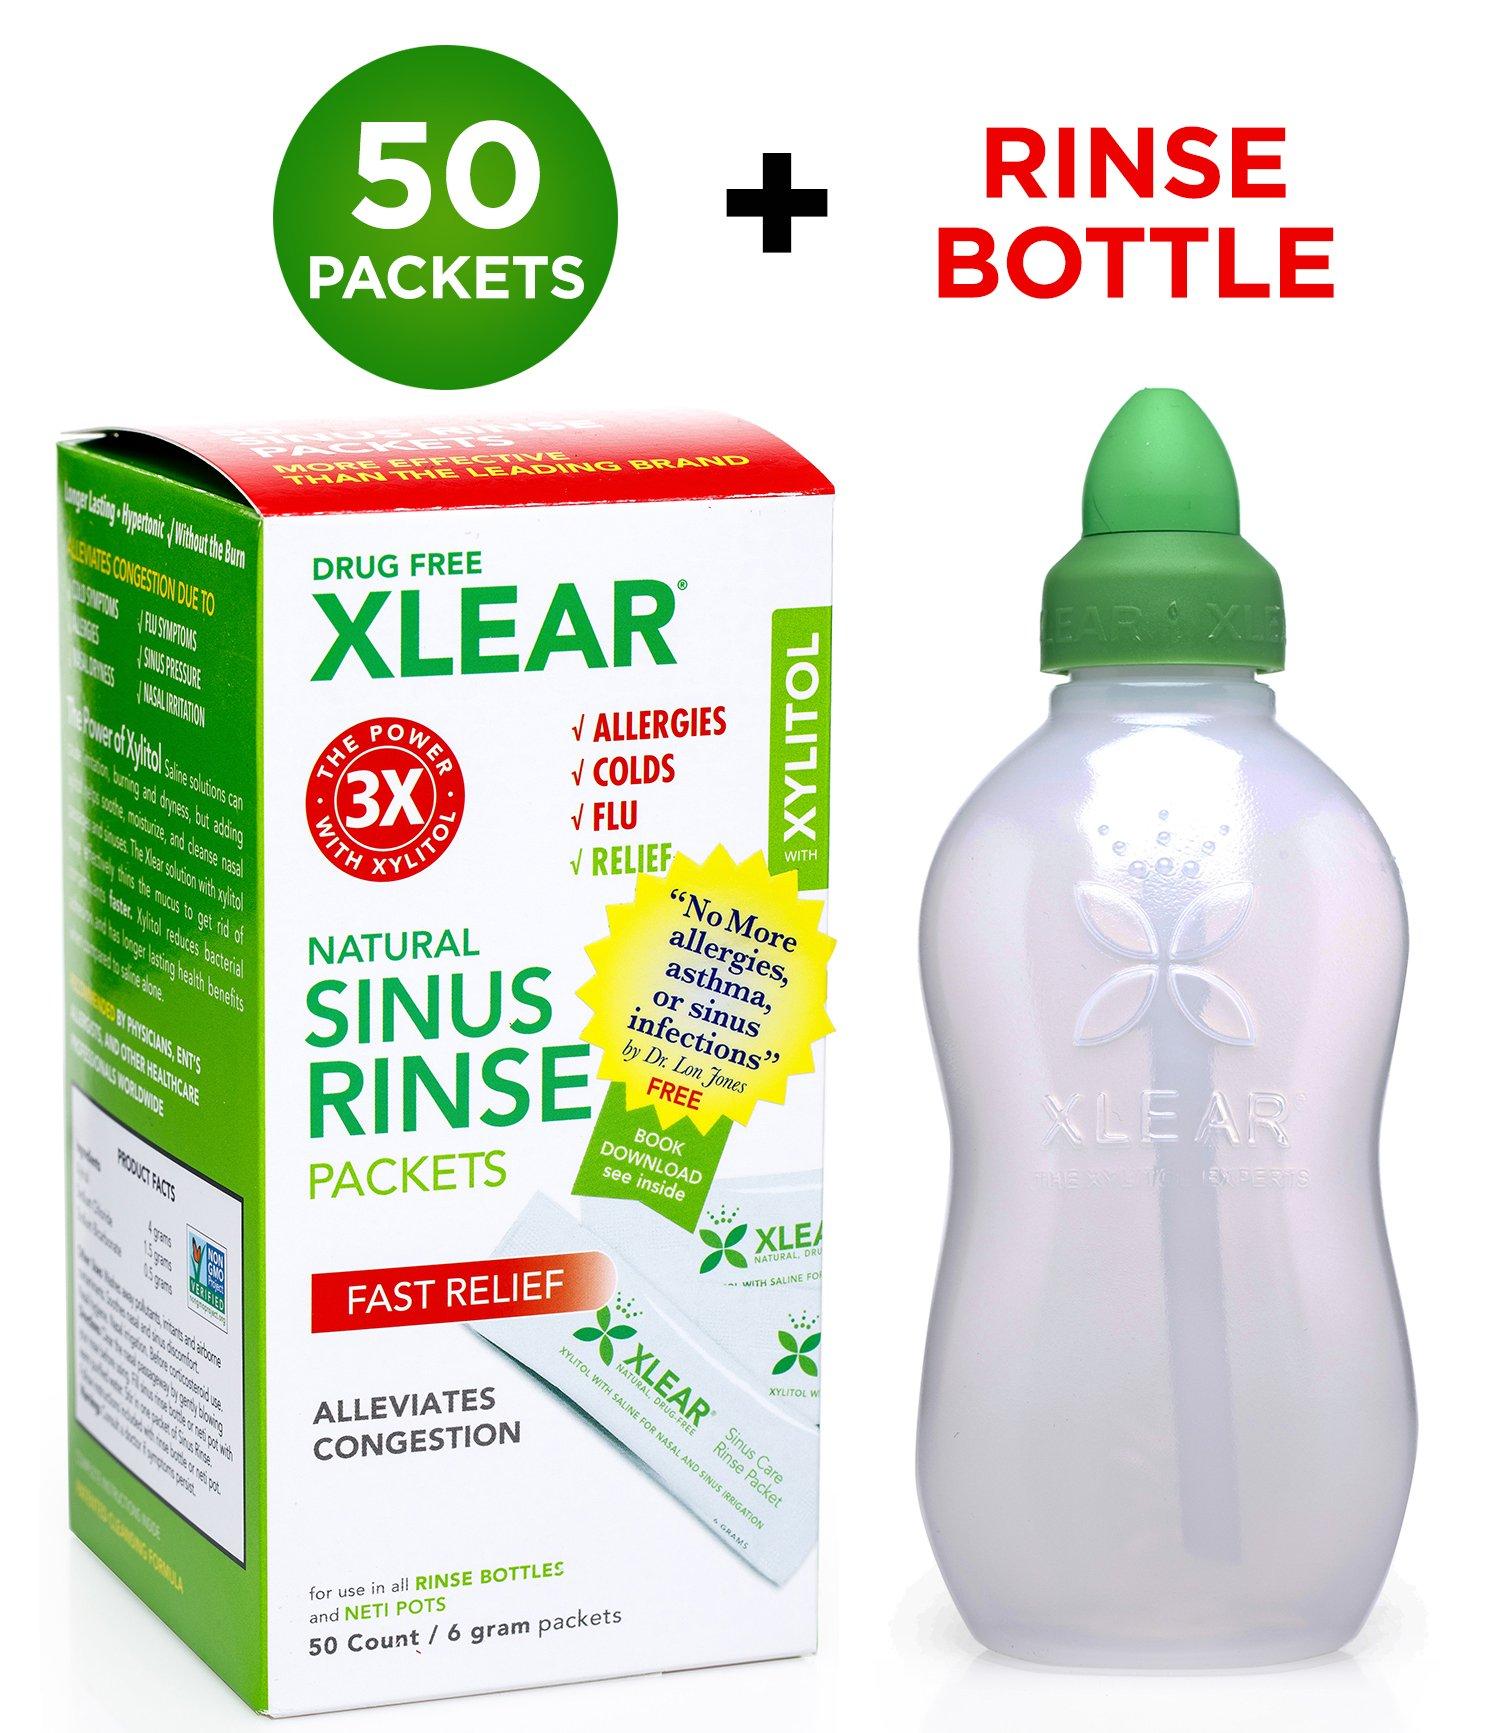 Xlear Sinus Rinse Kit (Bottle + 50 Packets): Nasal Rinse Irrigation Neti Bottle Set - Revolutionary Formula for Congestion Due to Allergies, Colds, Pet Dander, Hay Fever, Dust, Sinusitis, Flu